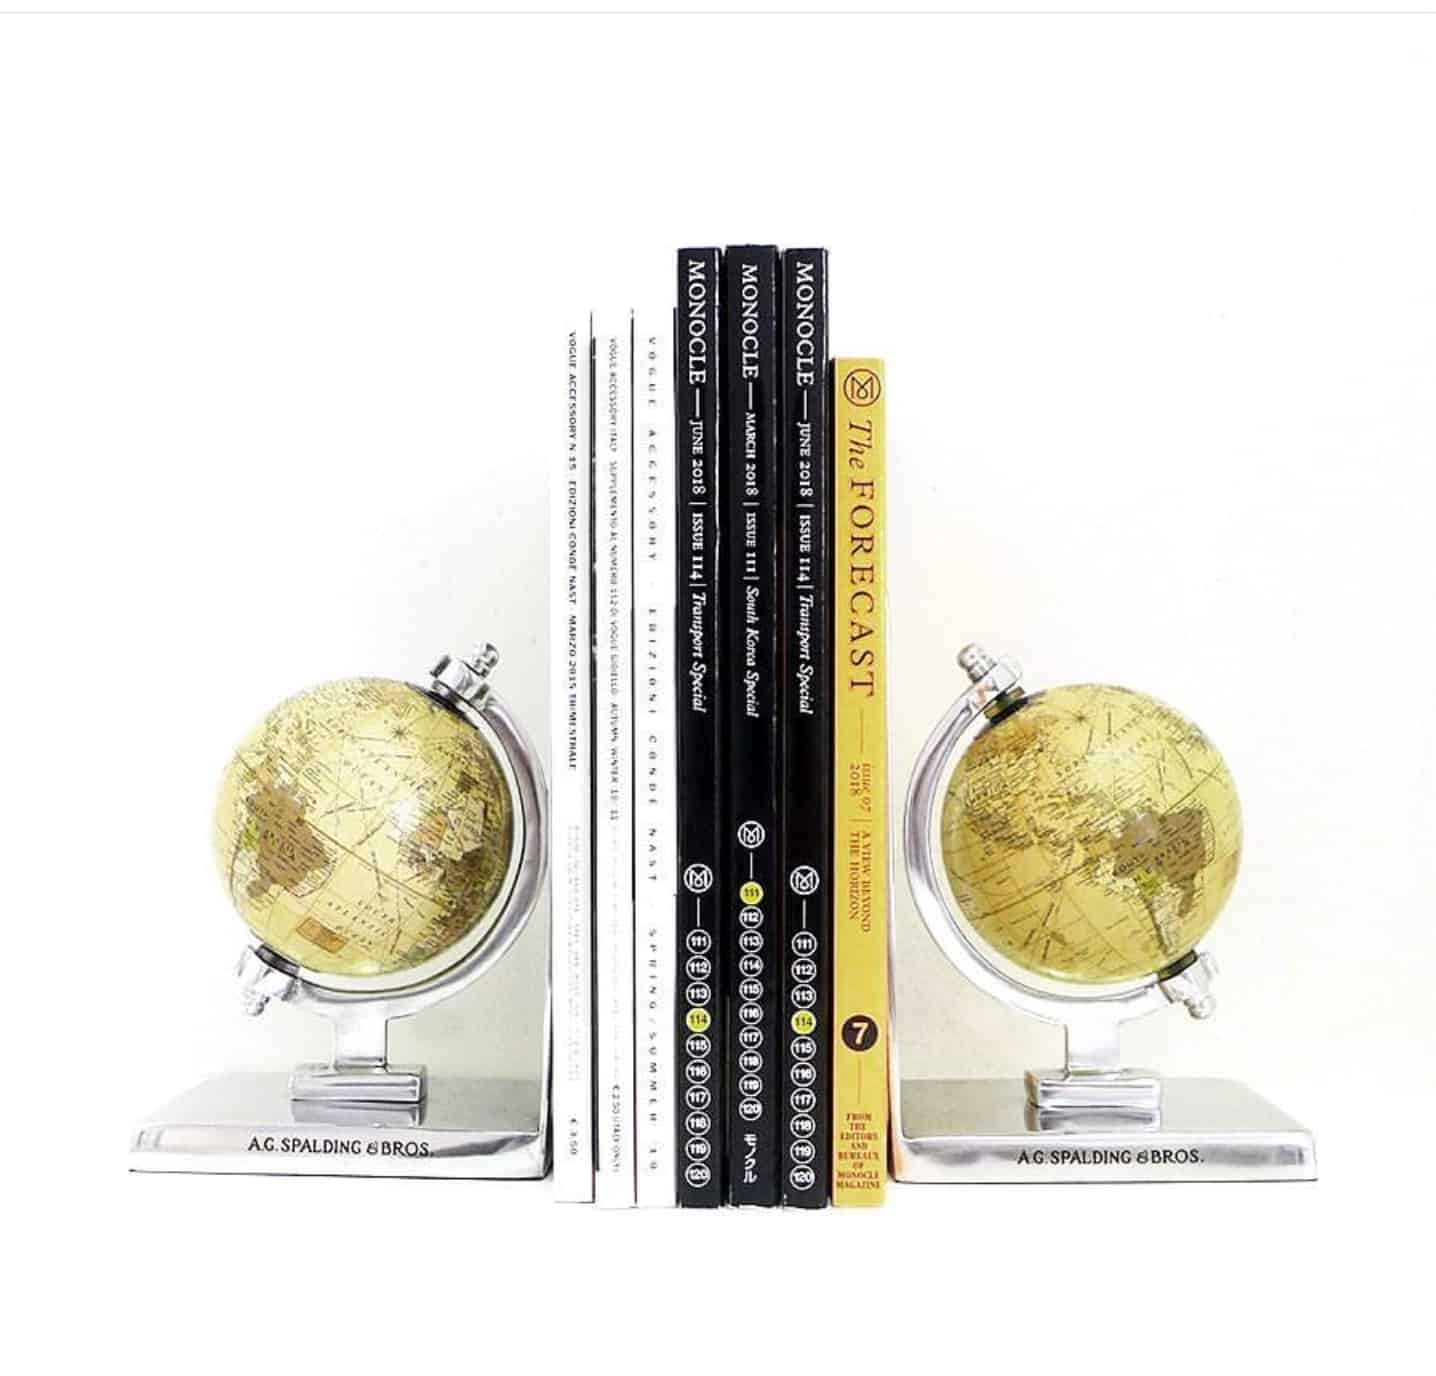 Spalding&Bros – Coppia di reggilibri Spalding&Bros con soggetto globi vintage – 862846U828